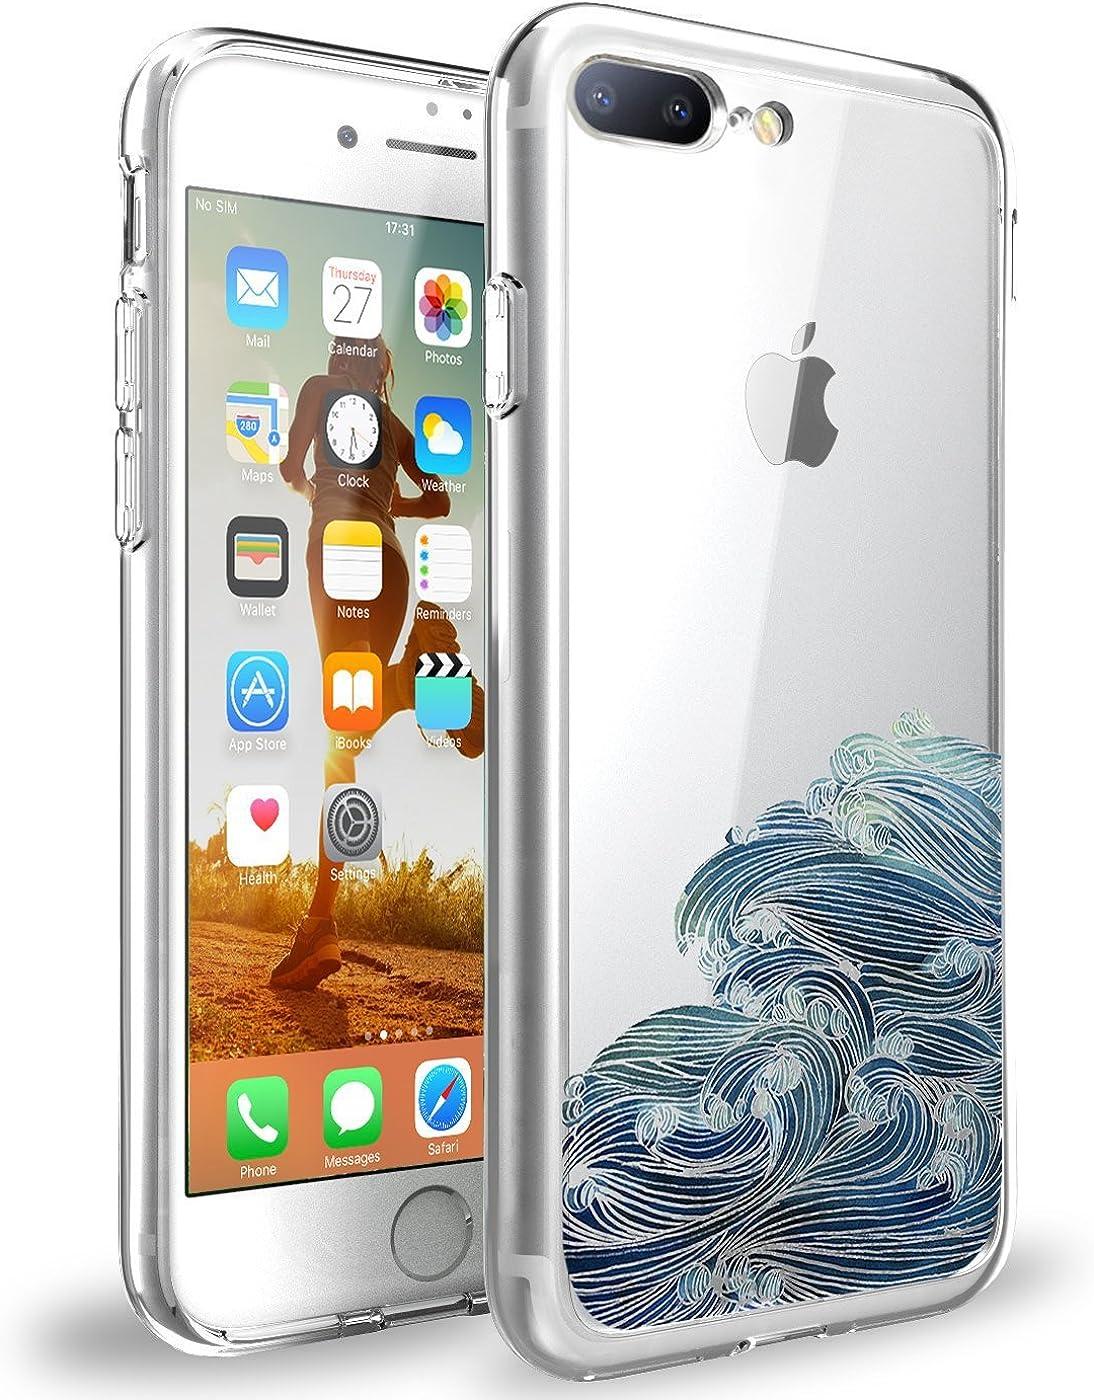 Teryei Funda iPhone 7 Plus/8 Plus TPU Silicona Carcasa [Ultra Slim] Full Protección Anti-Scratch Transparente Suave Caso Cover Anti-Golpes Rasguño Bumper para iPhone 7 Plus/8 Plus